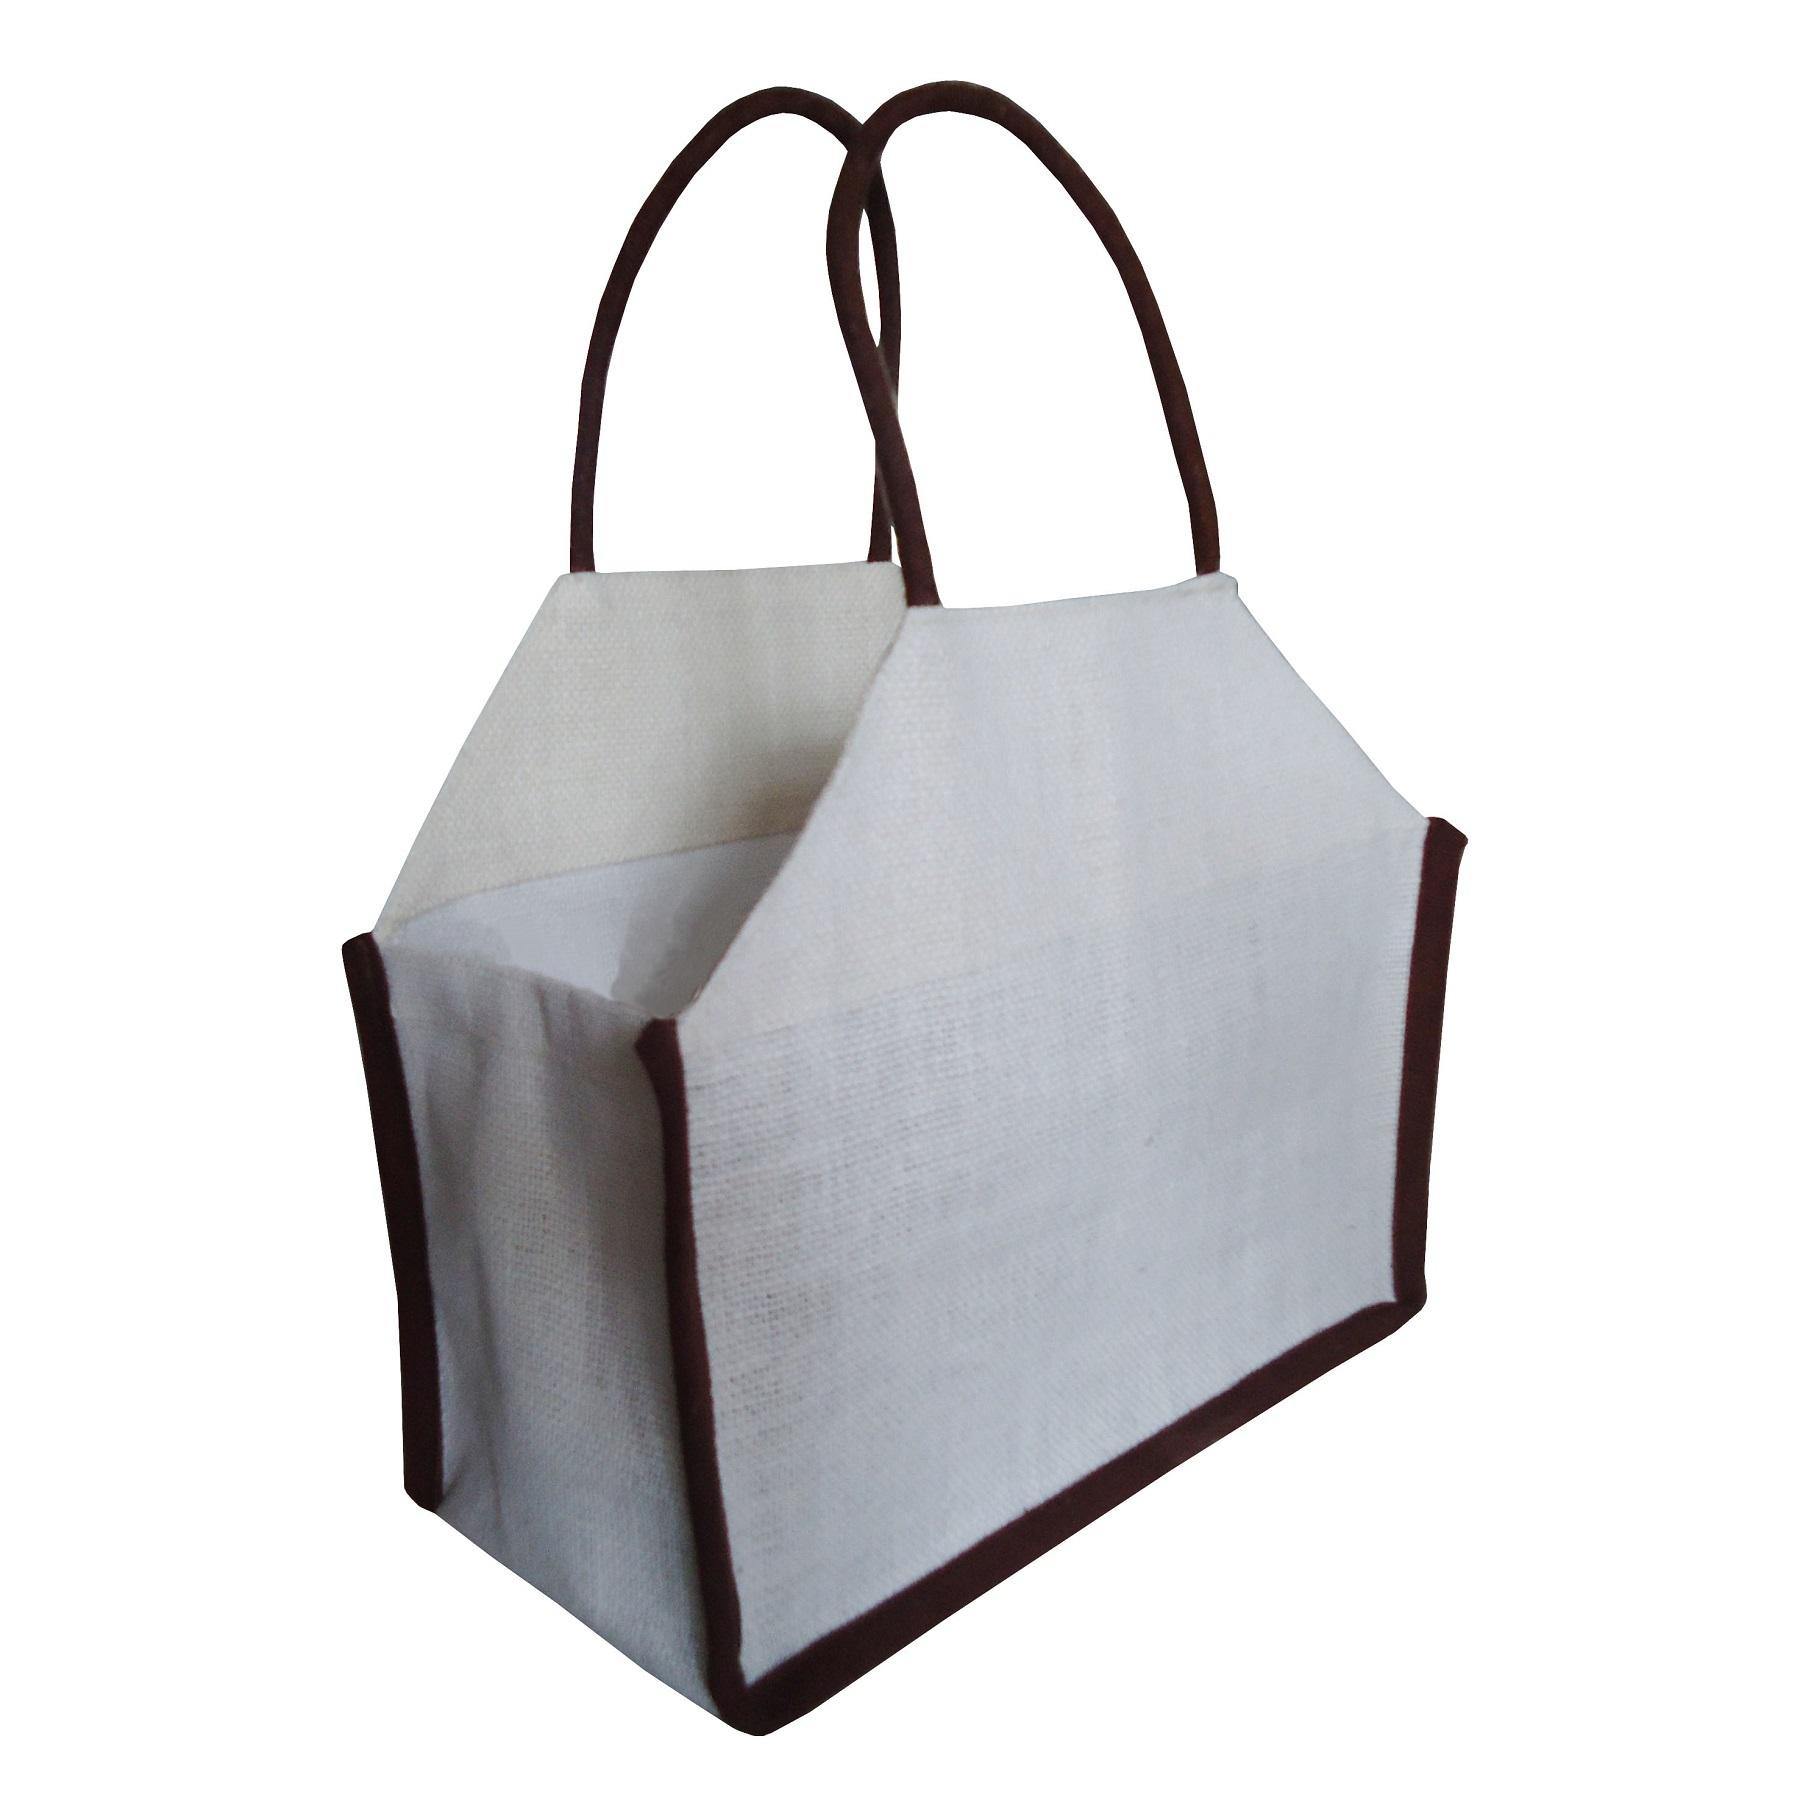 Bakery Packaging Promotional PP Laminated Jute Tote Bag